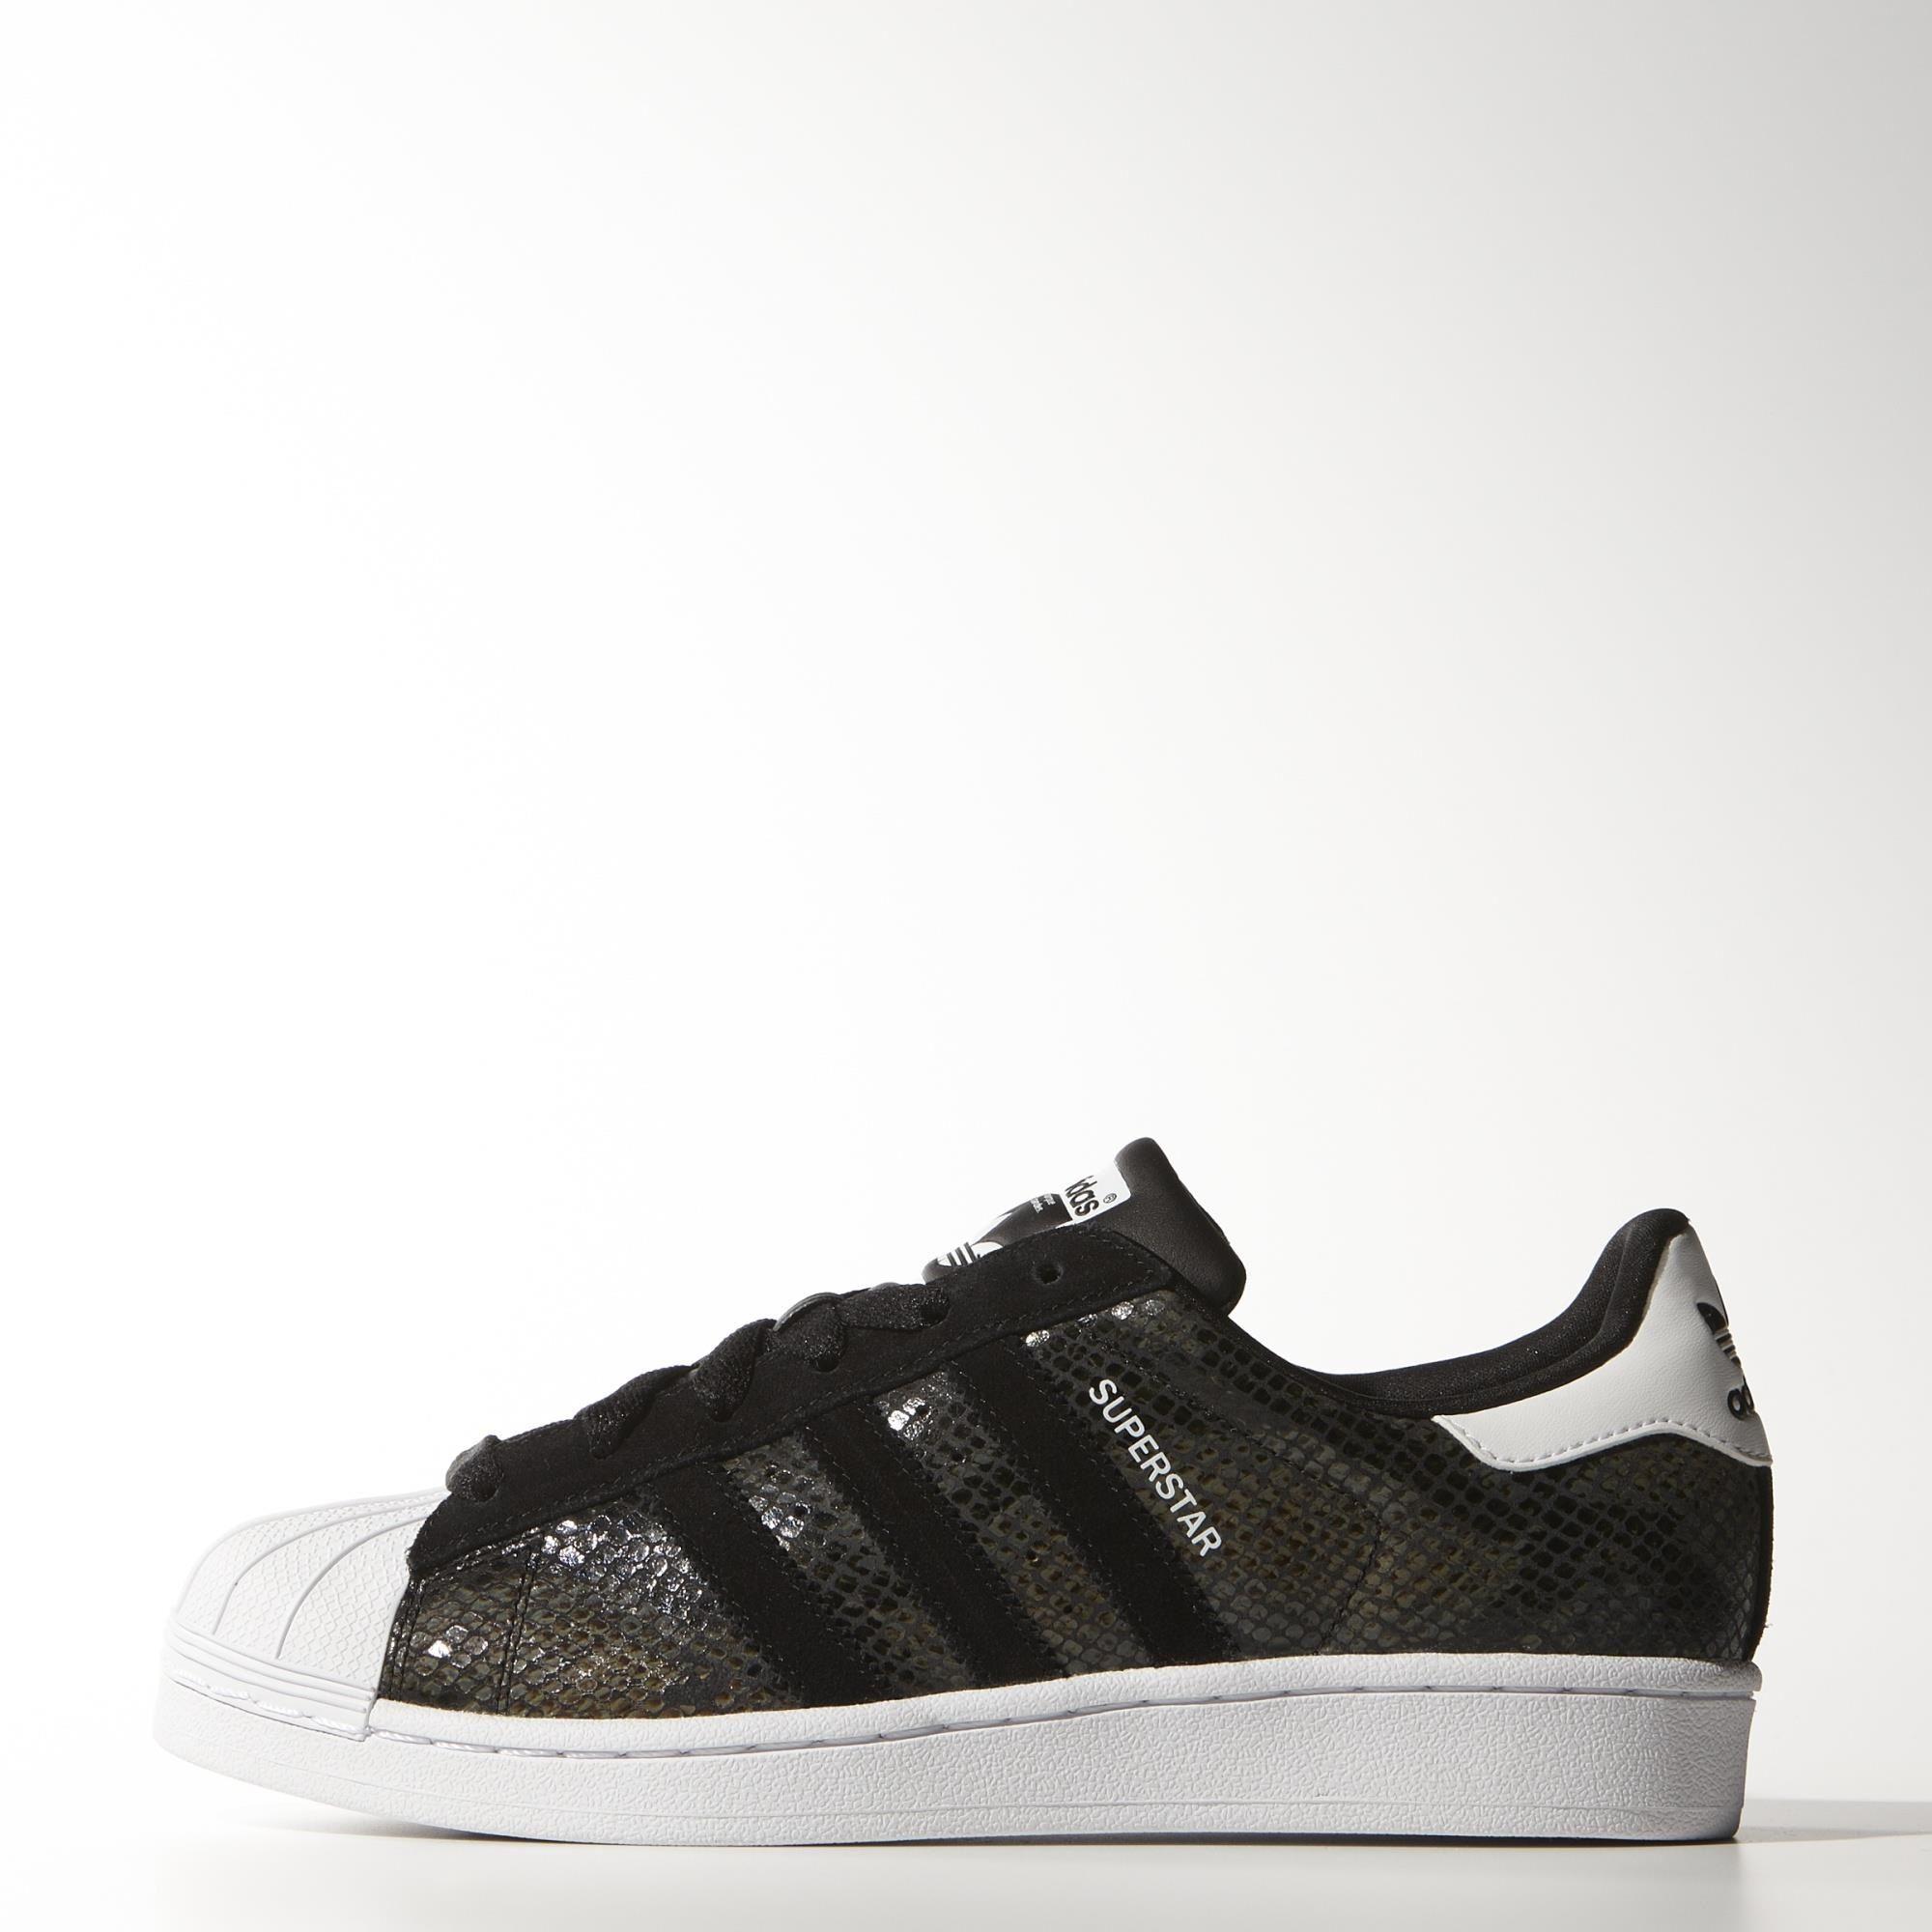 adidas superstar black croc